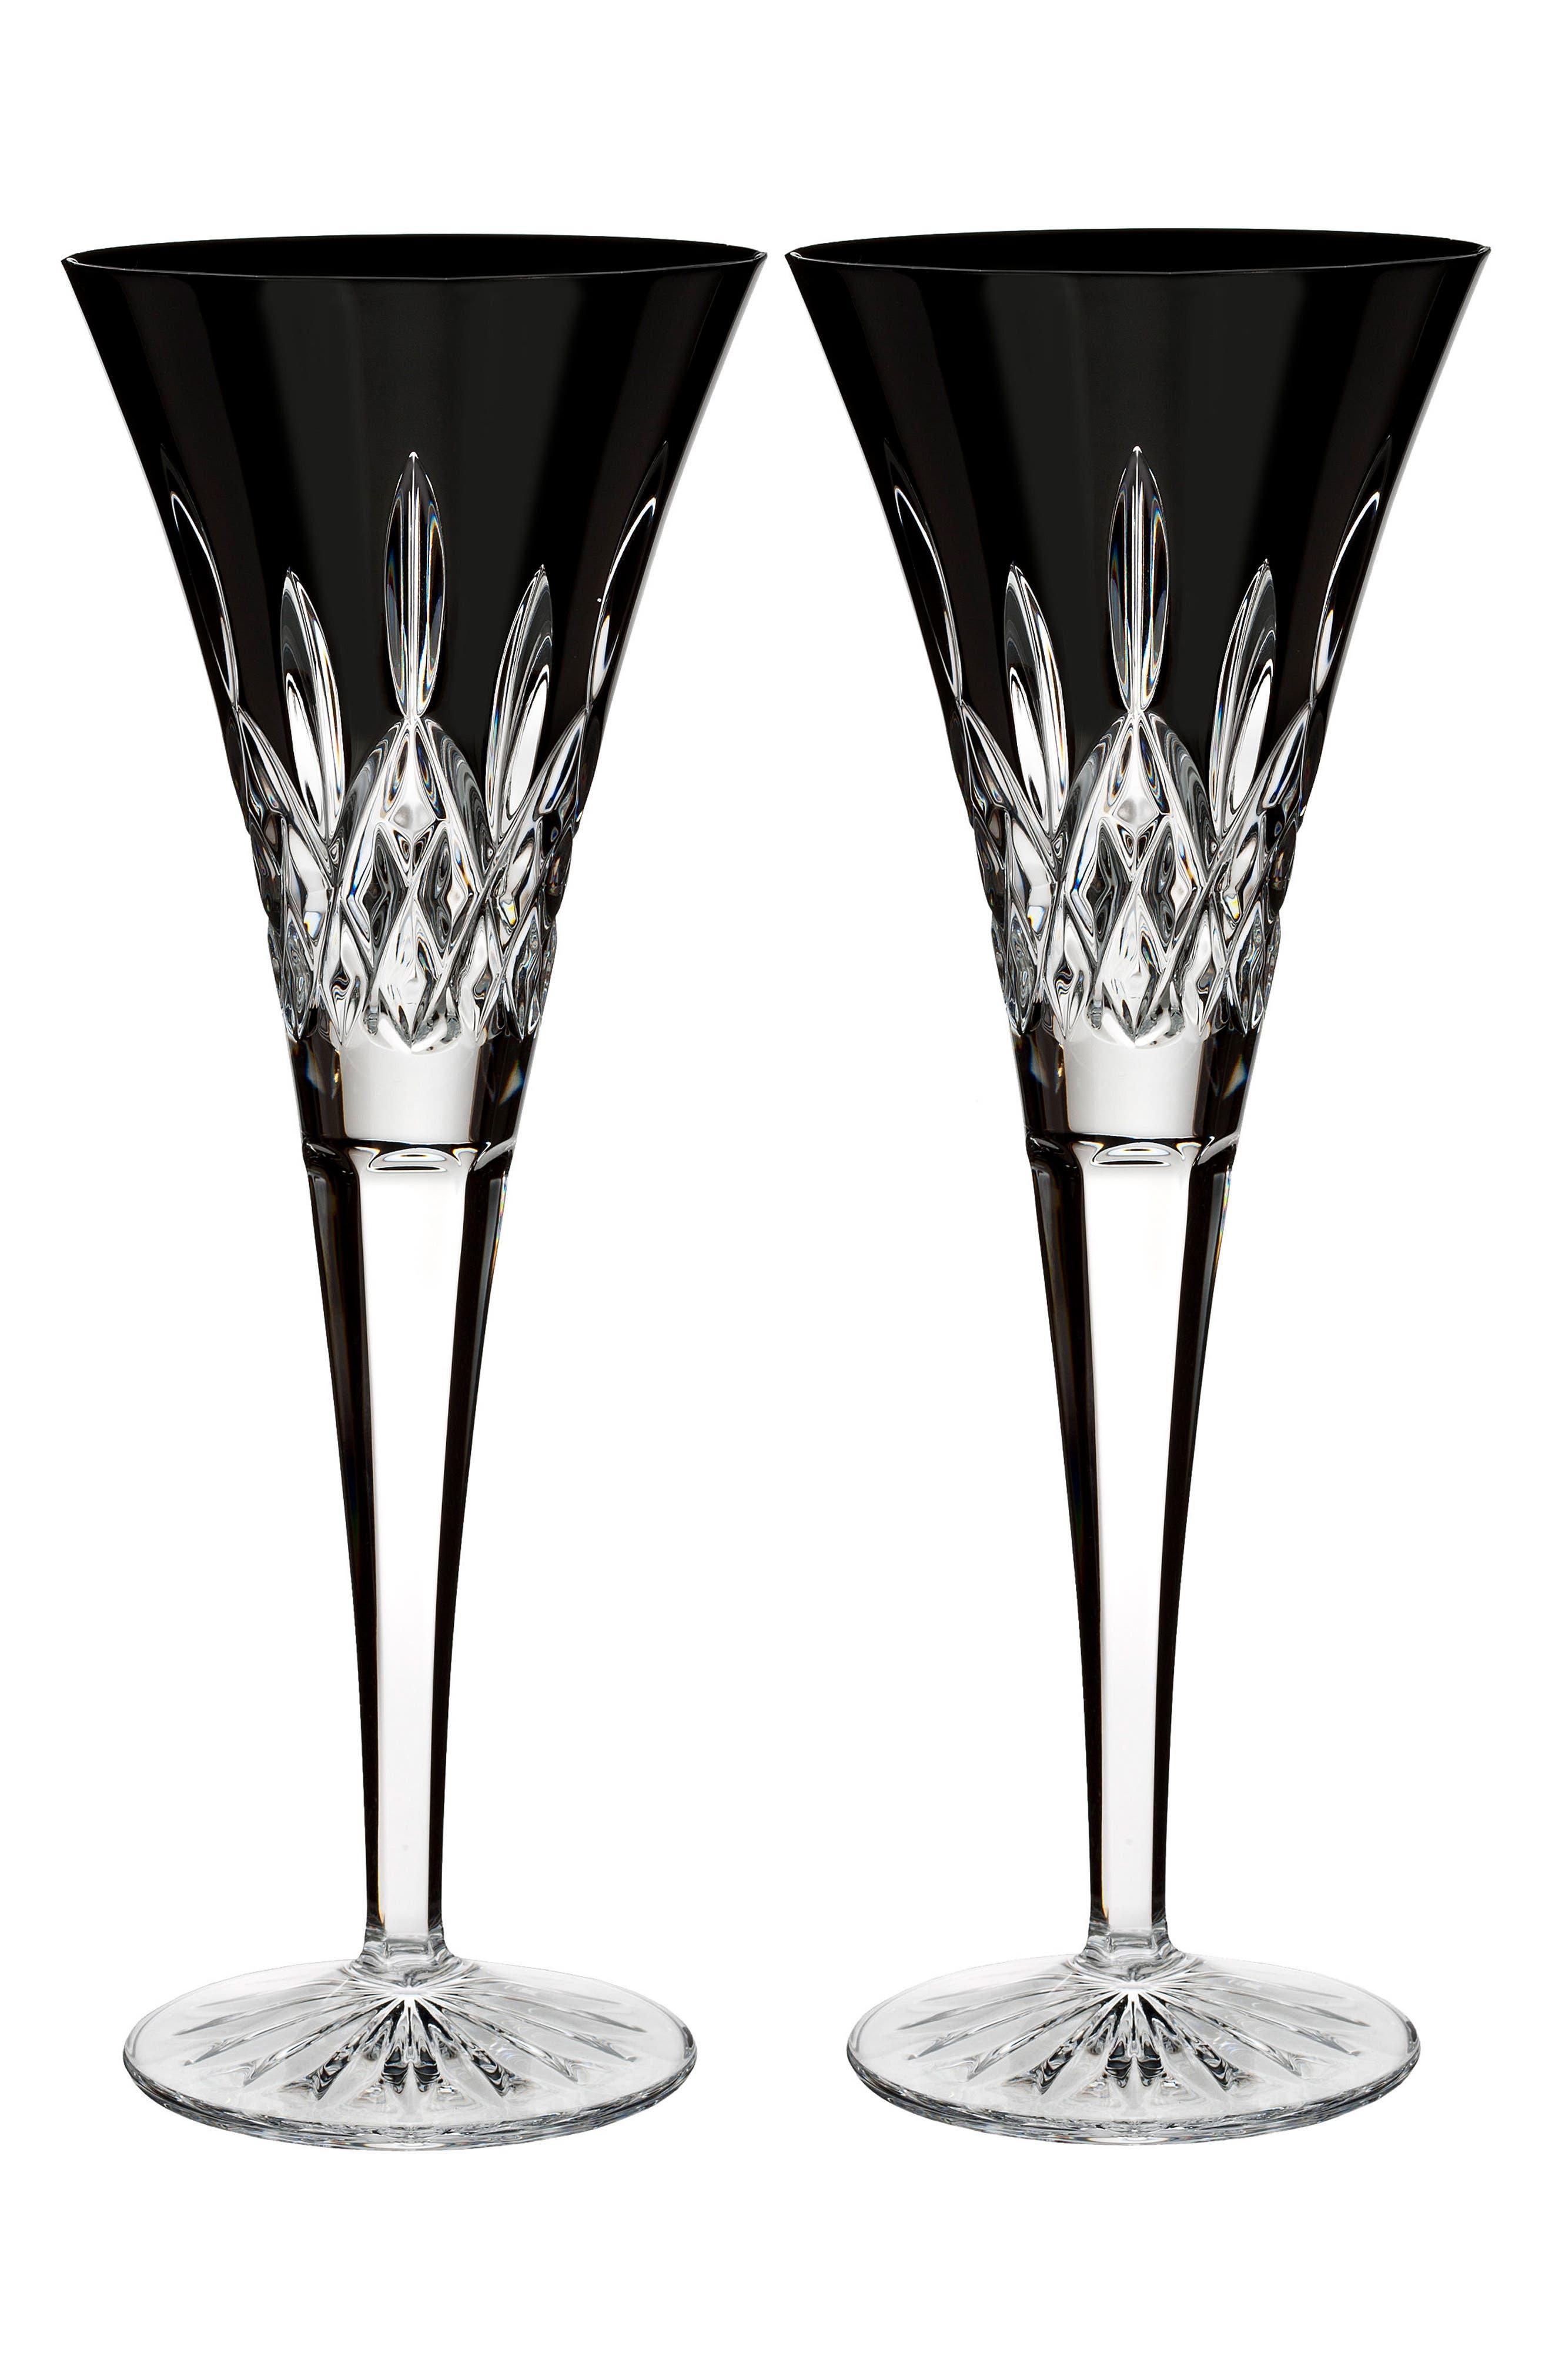 Lismore Diamond Set of 2 Black Lead Crystal Champagne Flutes,                             Main thumbnail 1, color,                             001